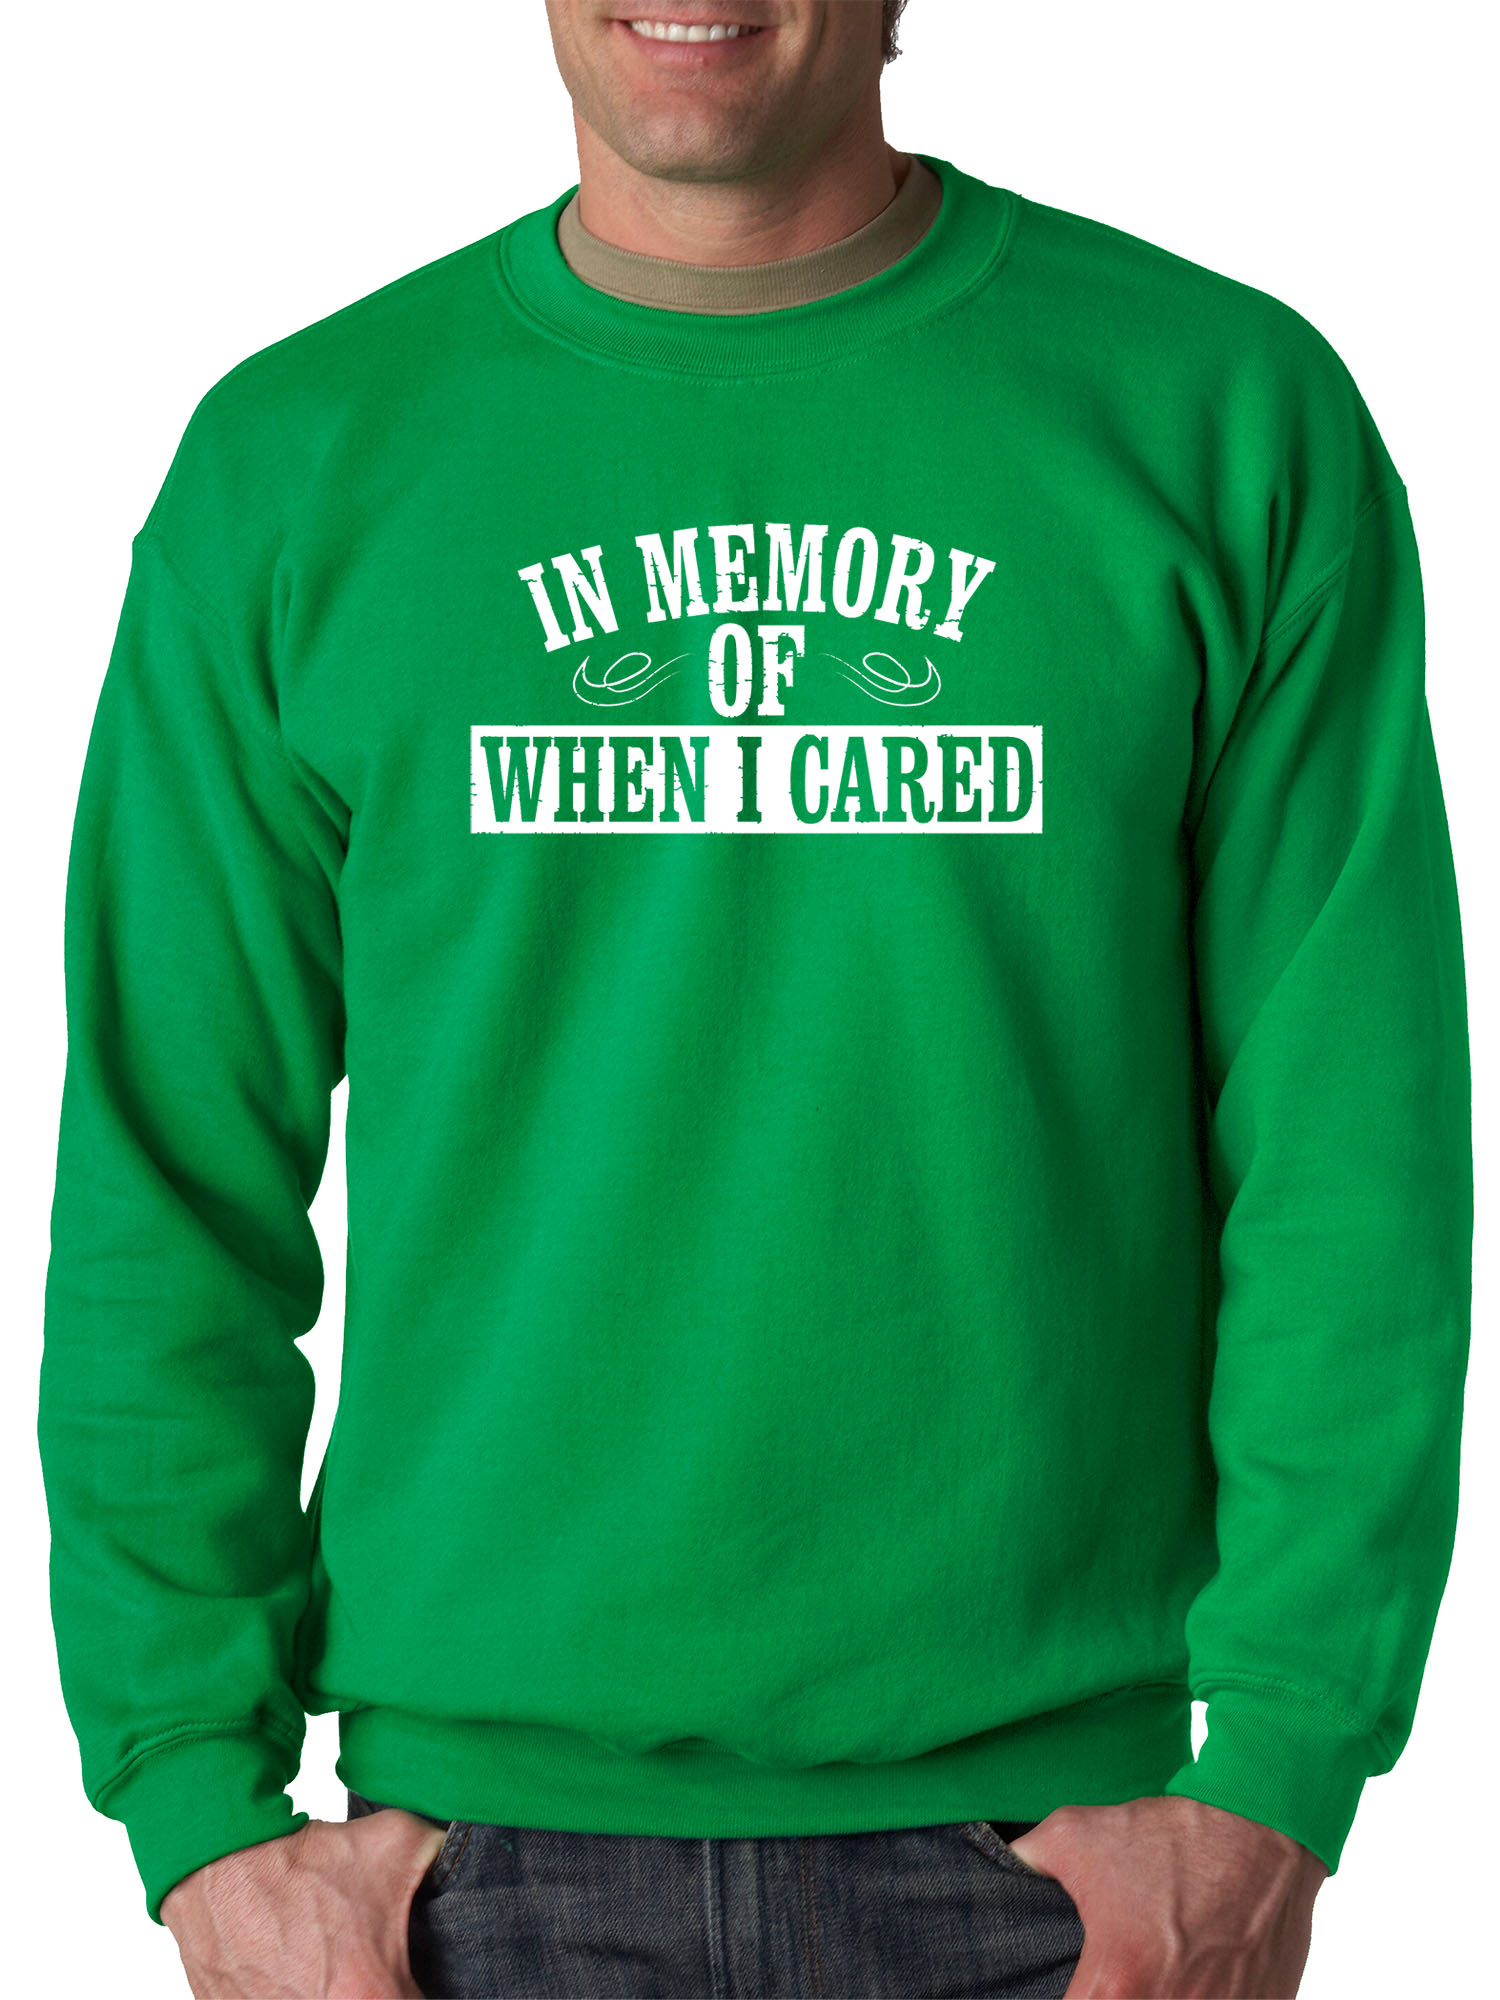 de23a224c Trendy USA 907 - Crewneck in Memory of When I Cared Sarcasm Funny Humor  Sweatshirt Medium Kelly Green - Walmart.com